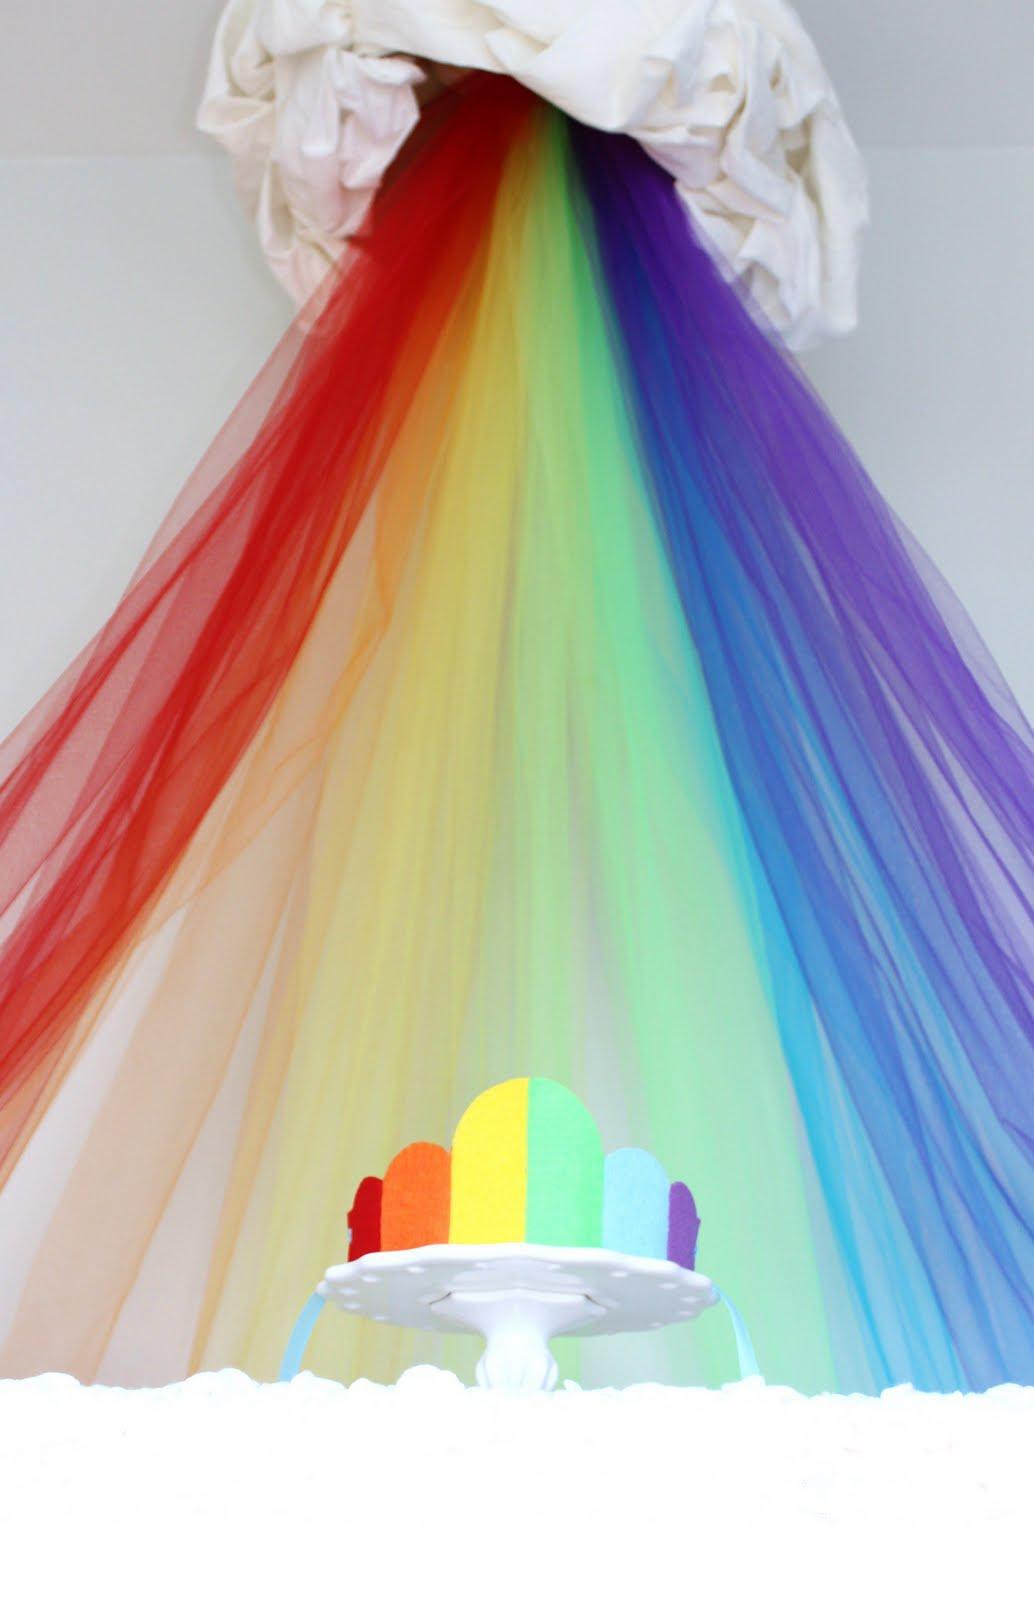 Icing Designs Rainbow Week Diy Rainbow Princess Crowns